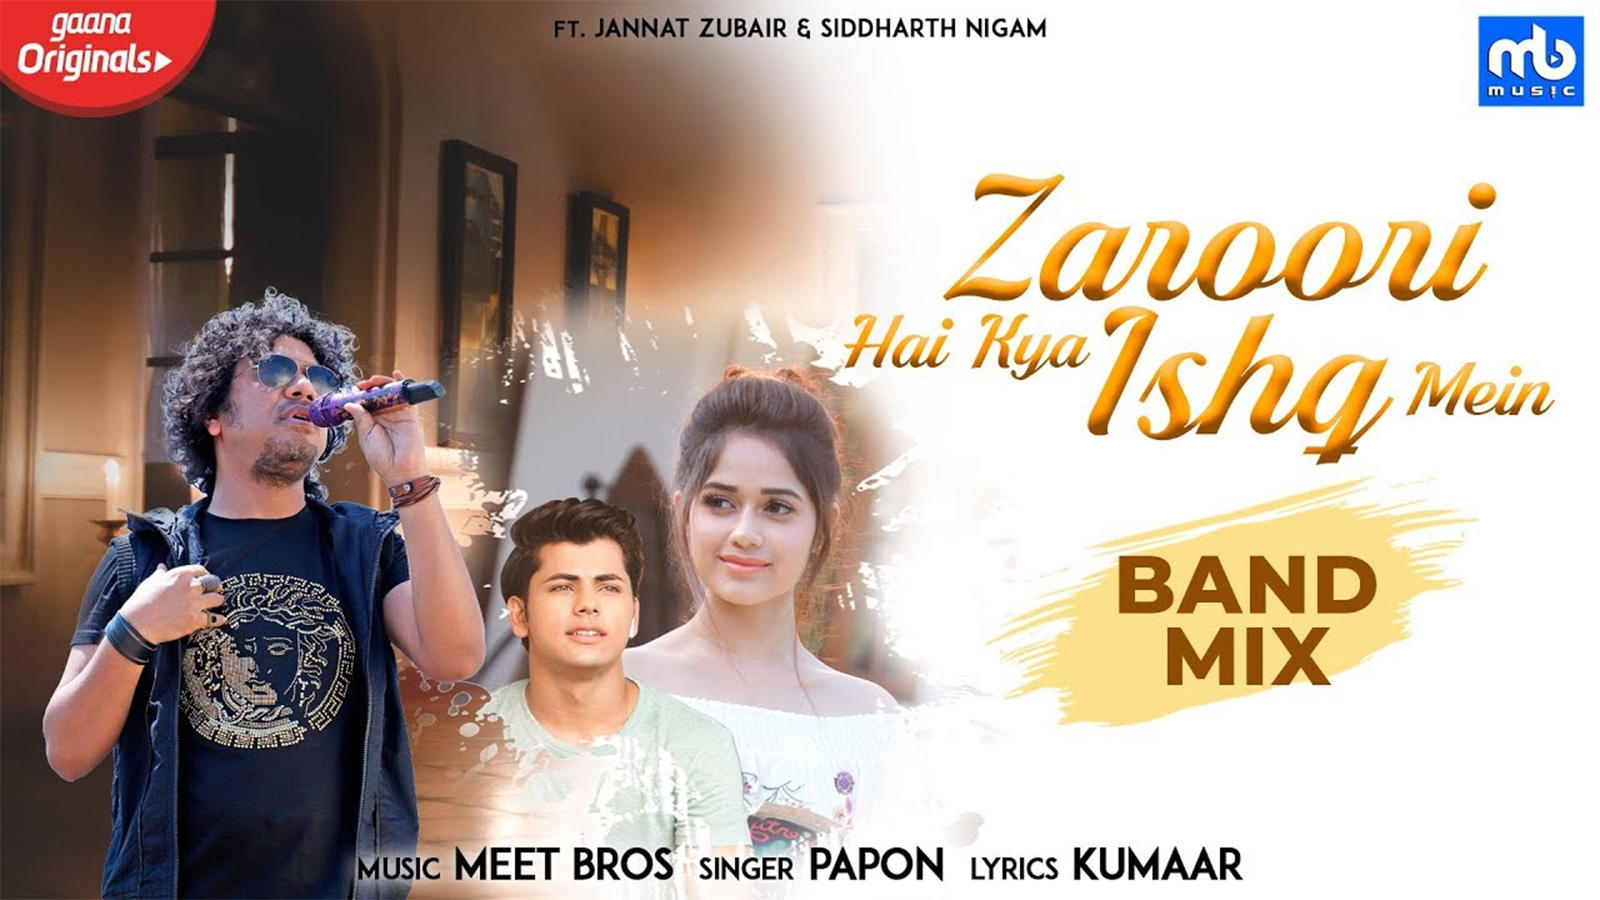 Latest Hindi Song 'Zaroori Hai Kya Ishq Mein' Sung By Meet Bros Featuring  Papon